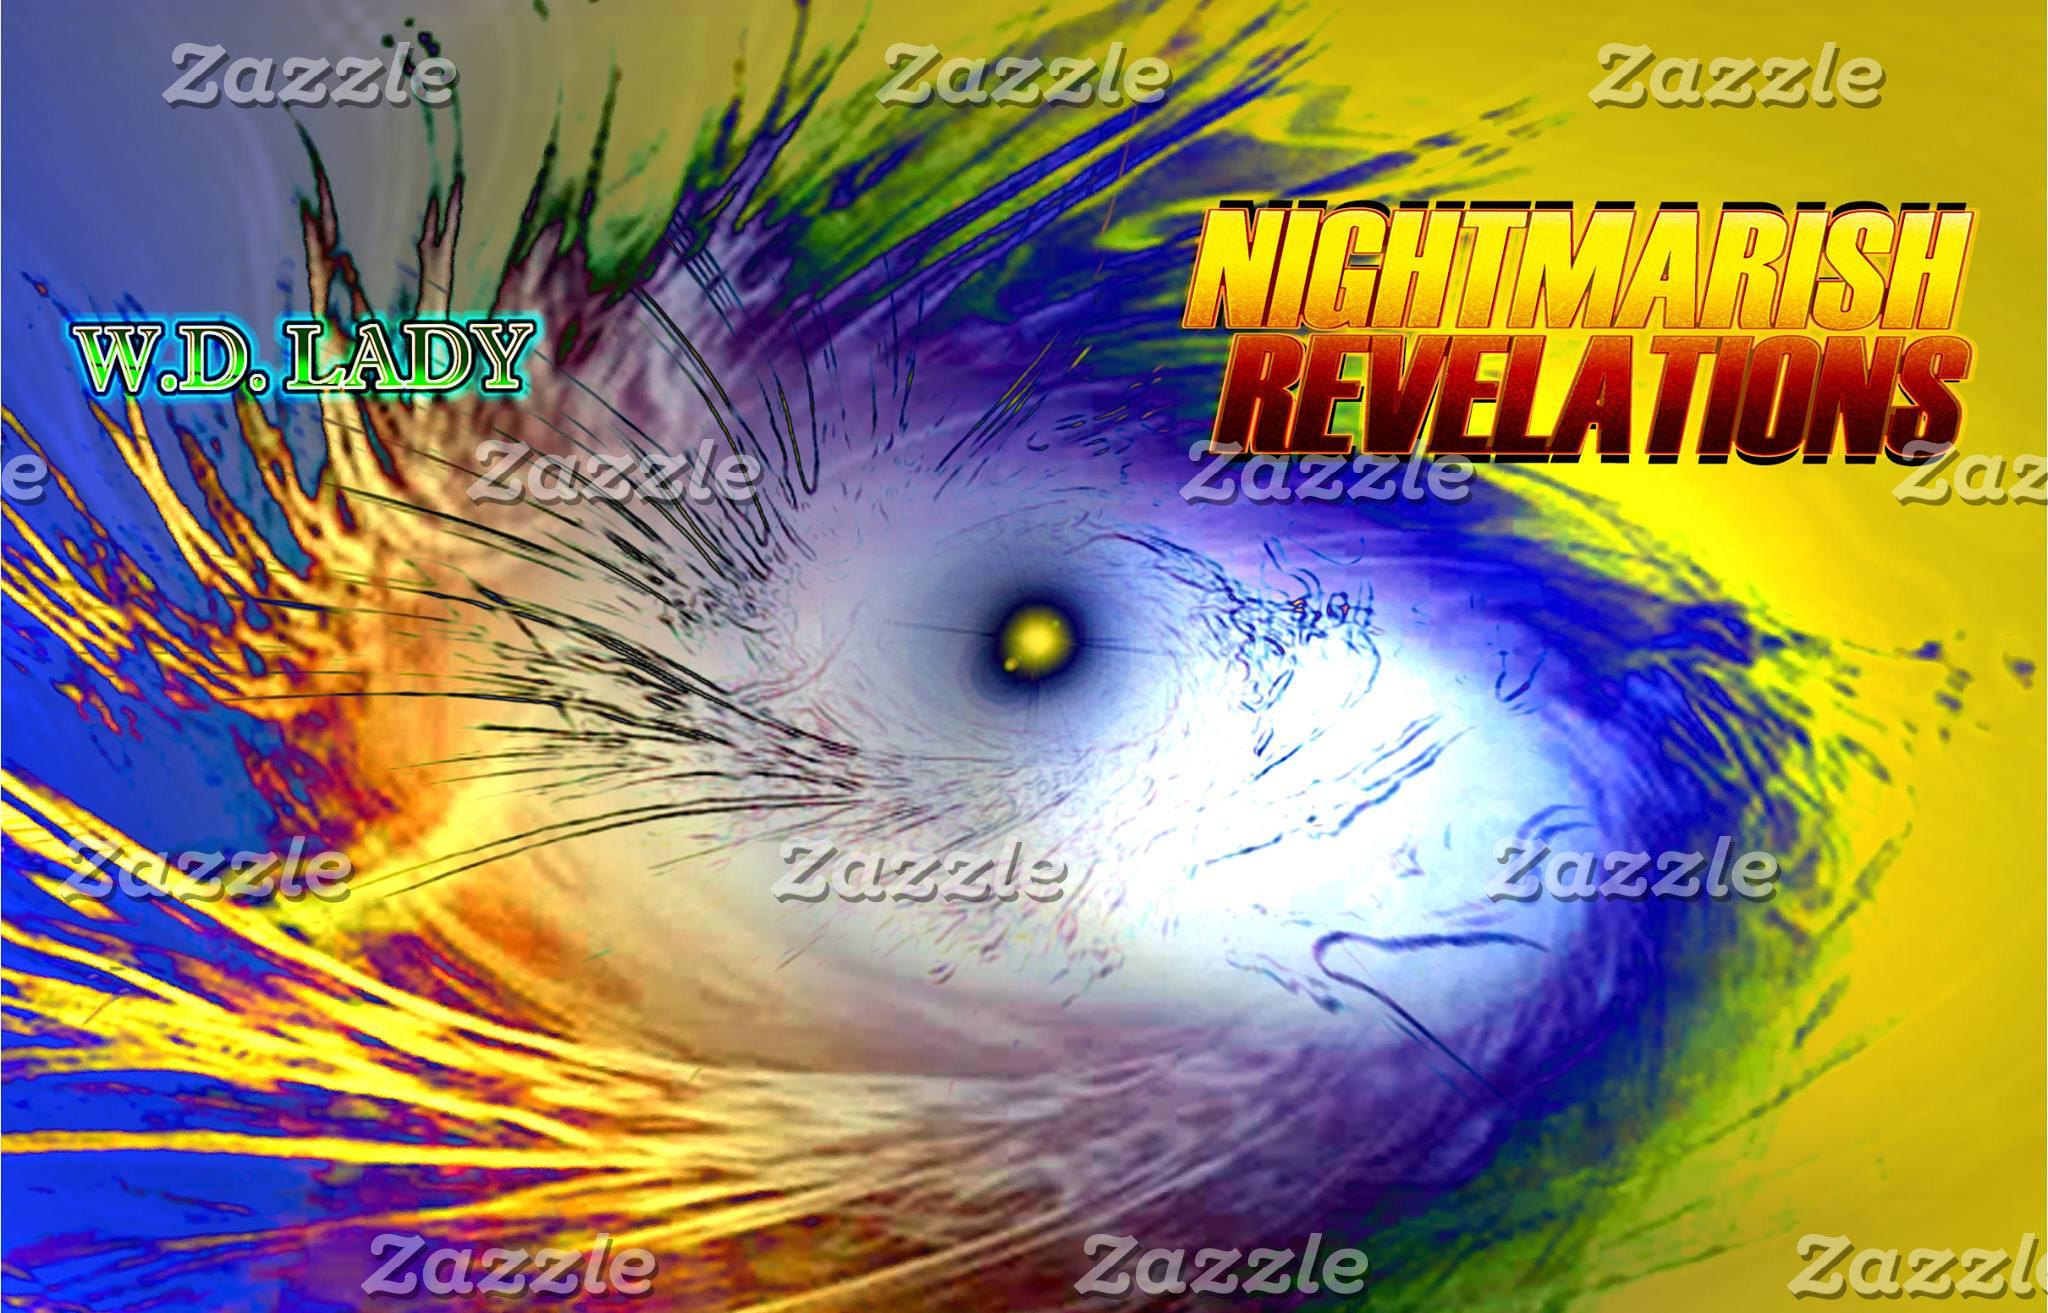 Nightmarish Revelations